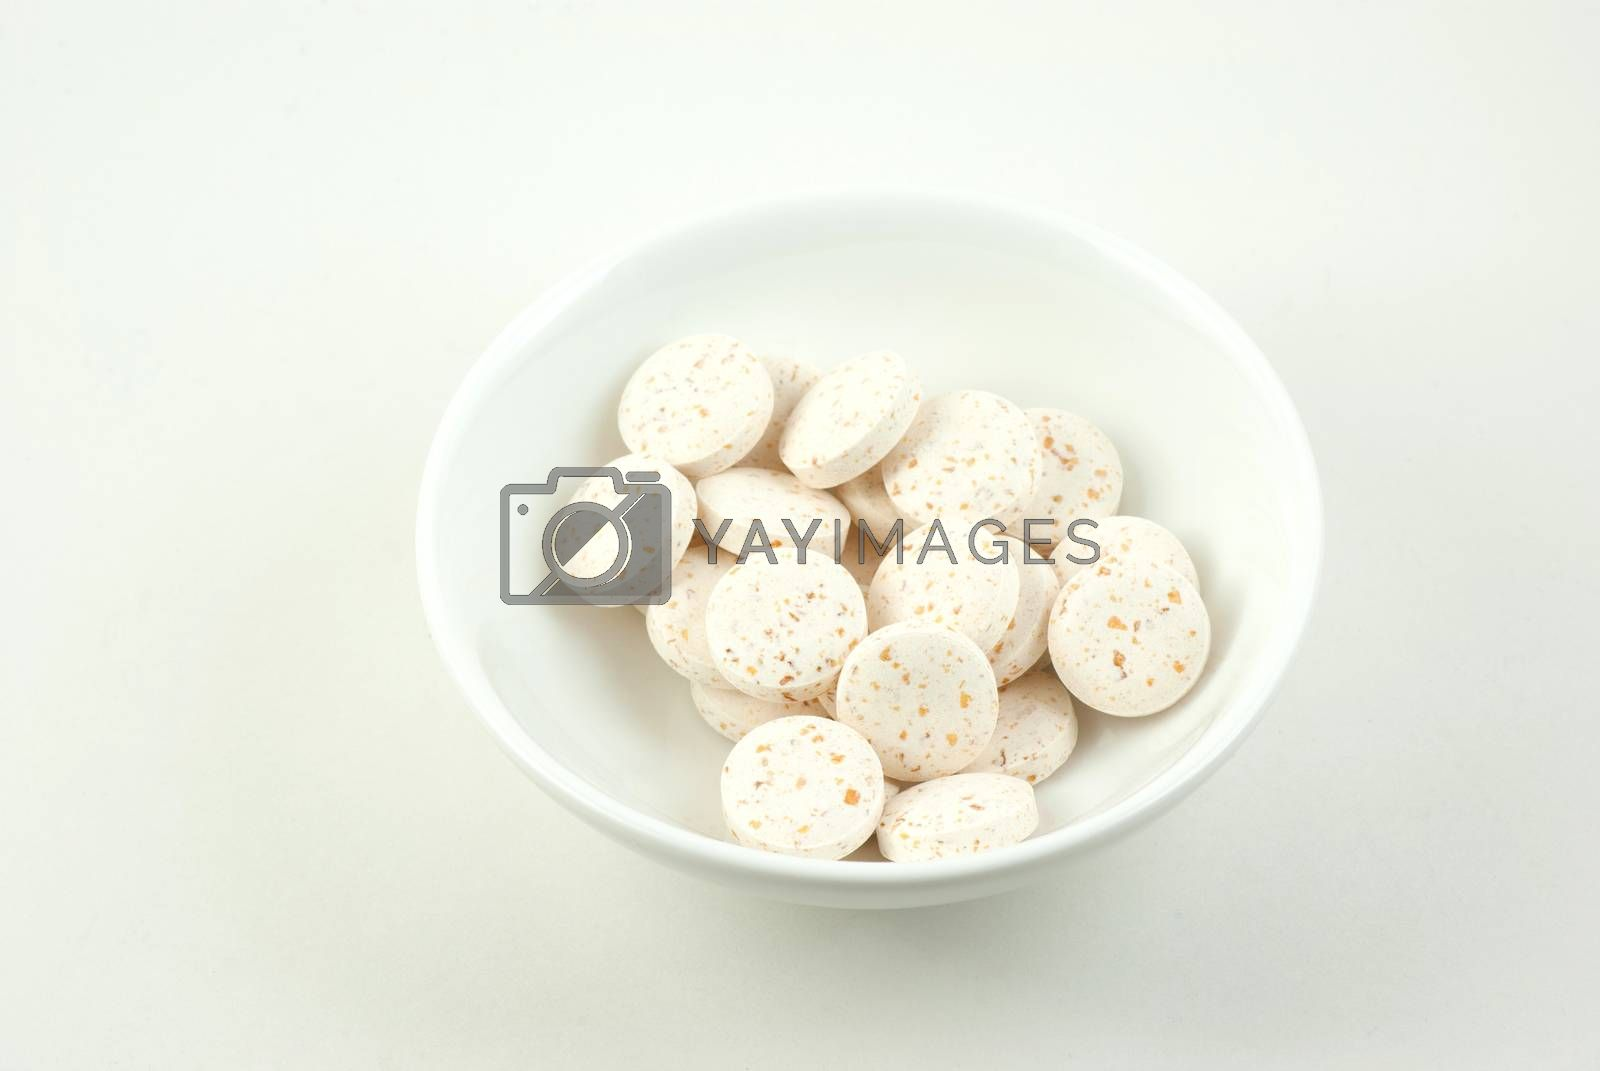 Small dish containing vitamin C pills